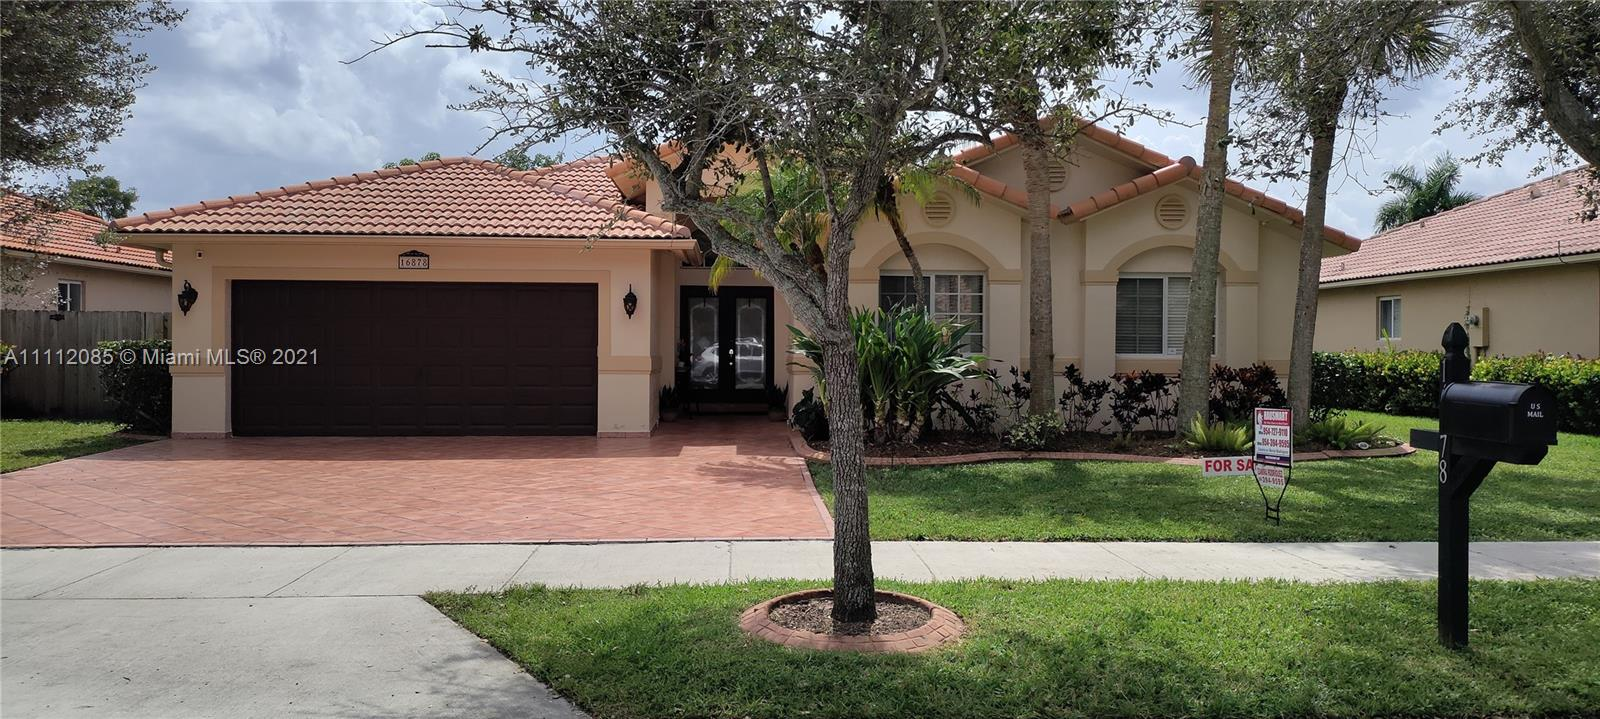 16878  Crestview Ln  For Sale A11112085, FL